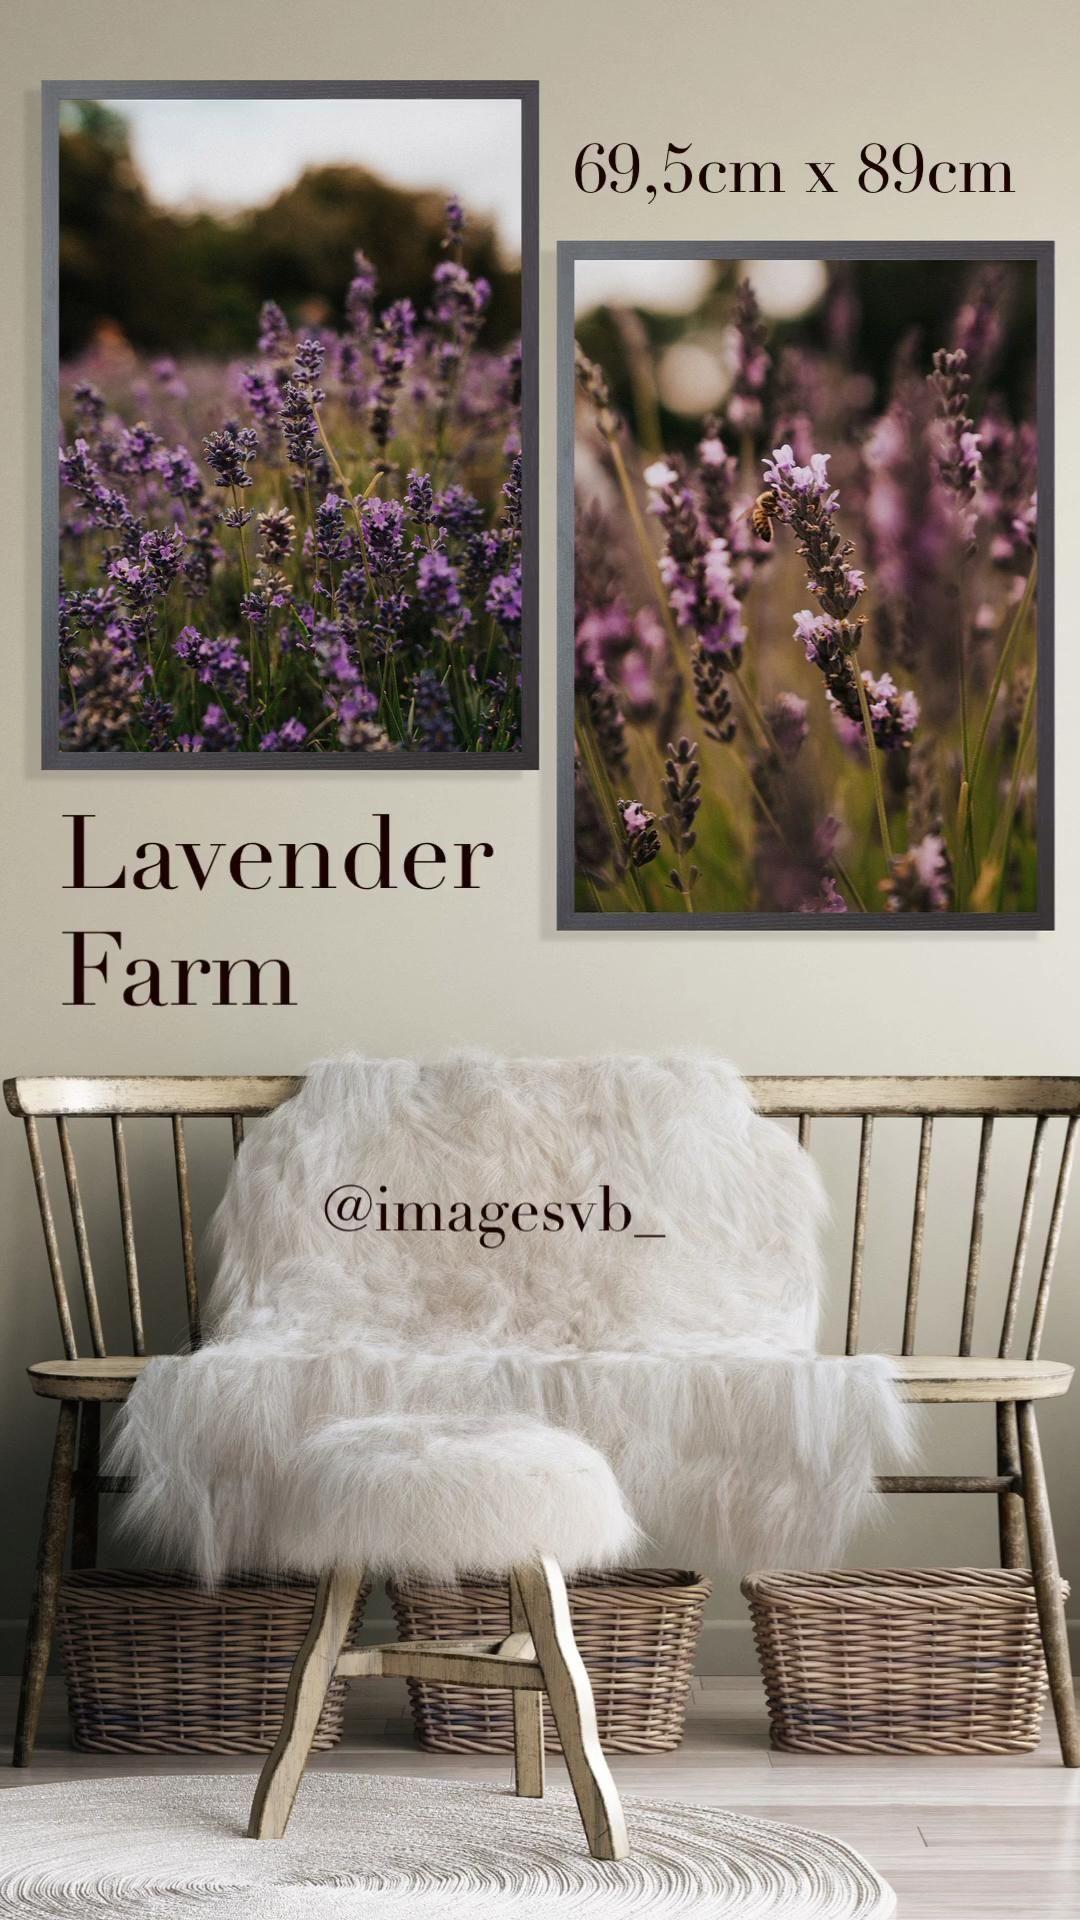 Authentic prints from Lavender Field #photography #photooftheday #printing #prints #printablewallart #wallpapers #wallartdecor #photographers #london #photographerlife #posters #posterart #lavender